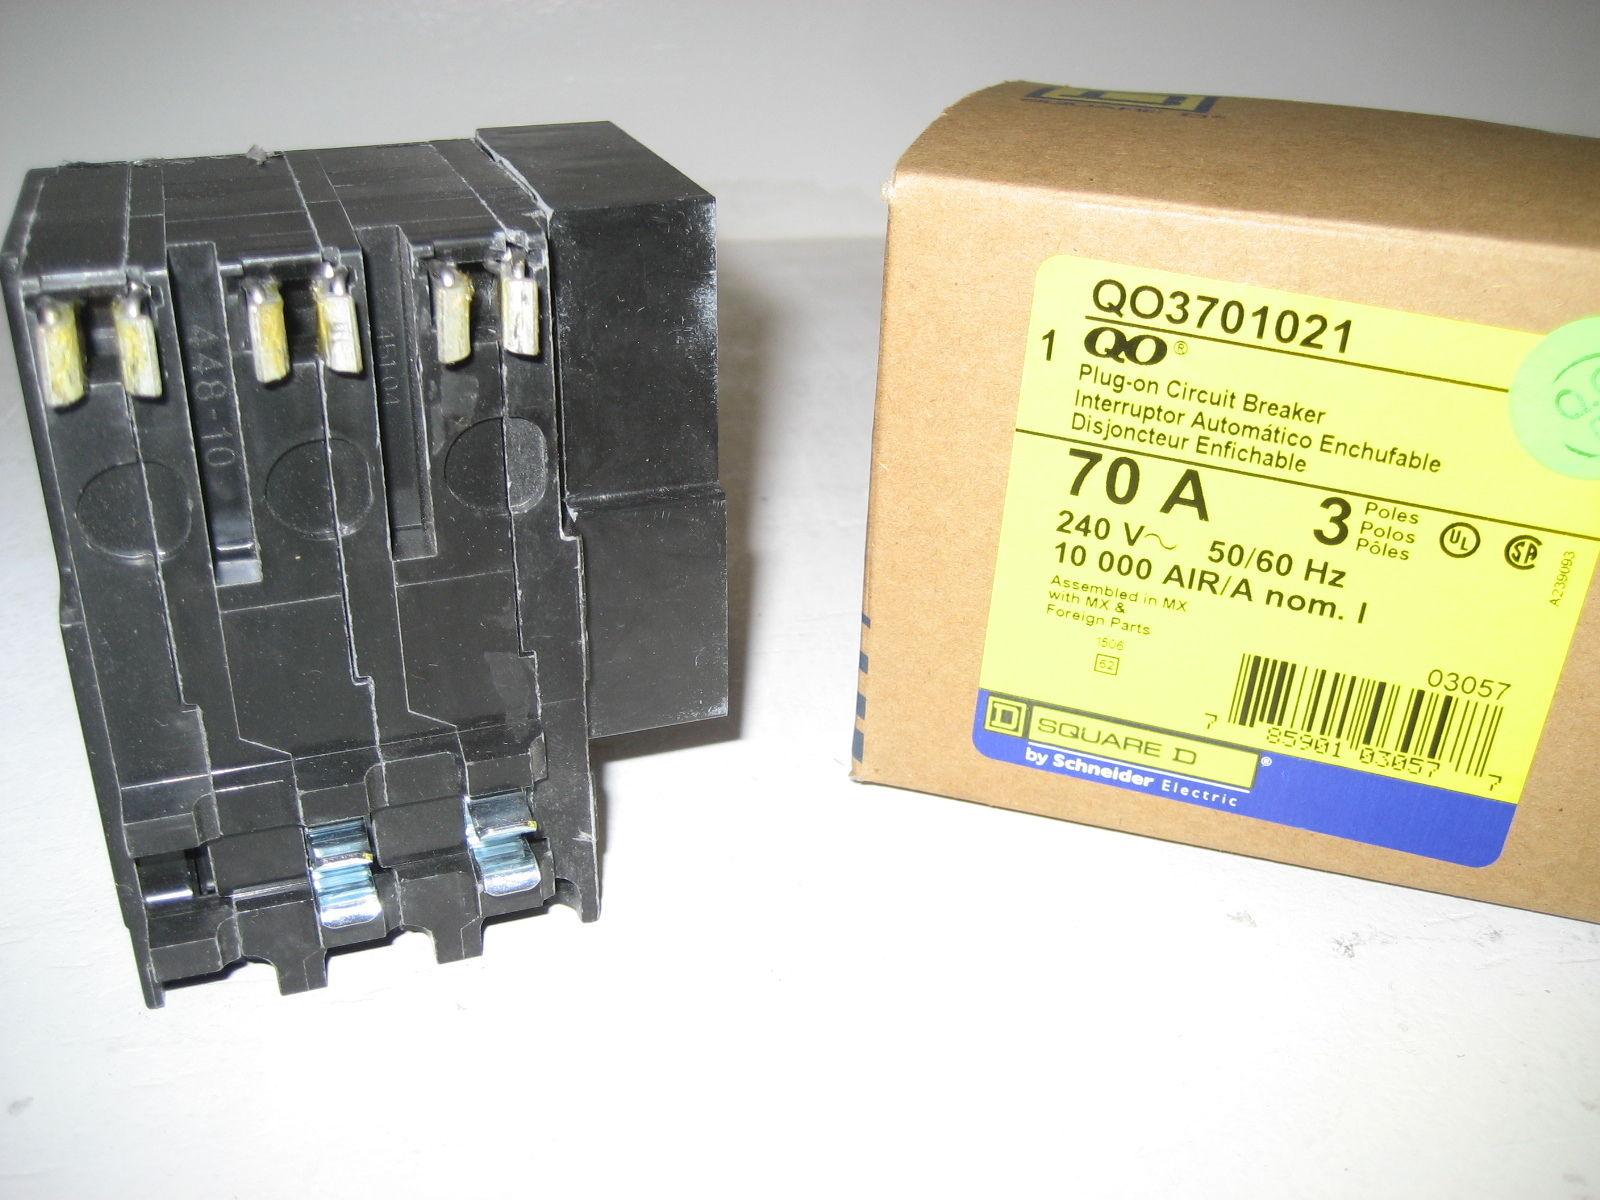 New Square D Shunt Trip Breaker Qo3701021 3 Pole 70 Amp Box 1